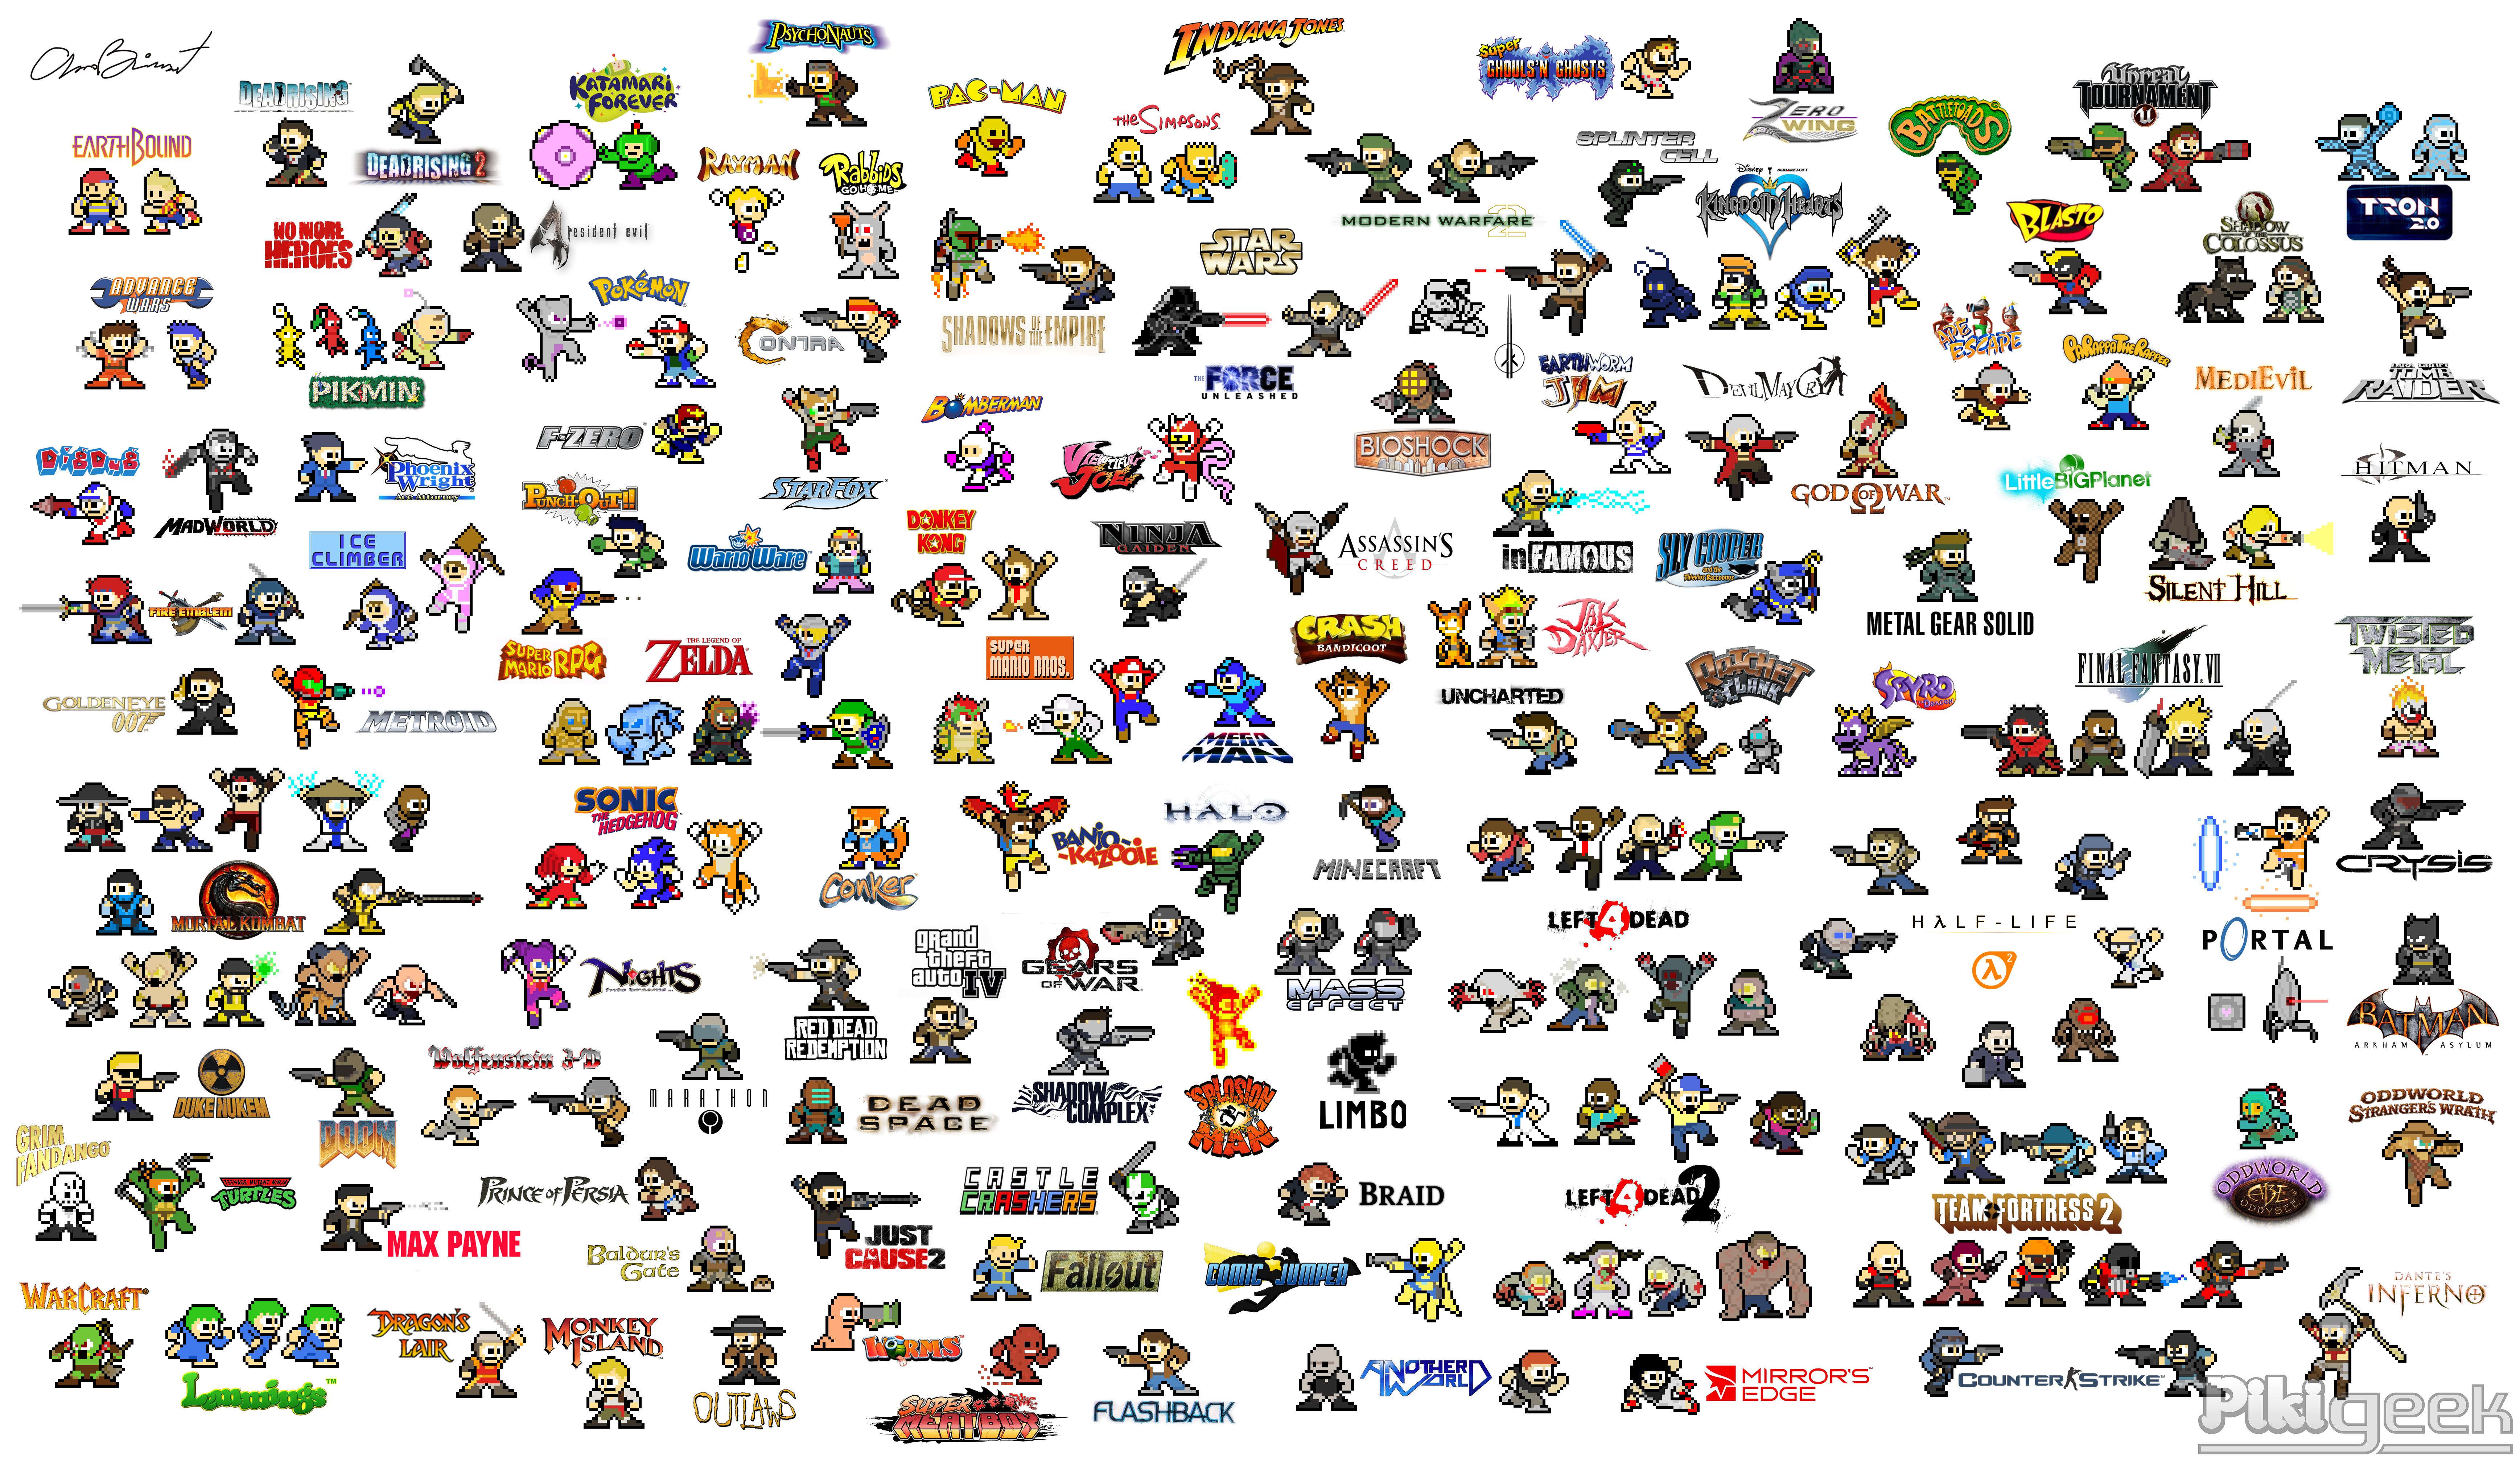 Game slike - Page 2 Character_sprites_mega_man